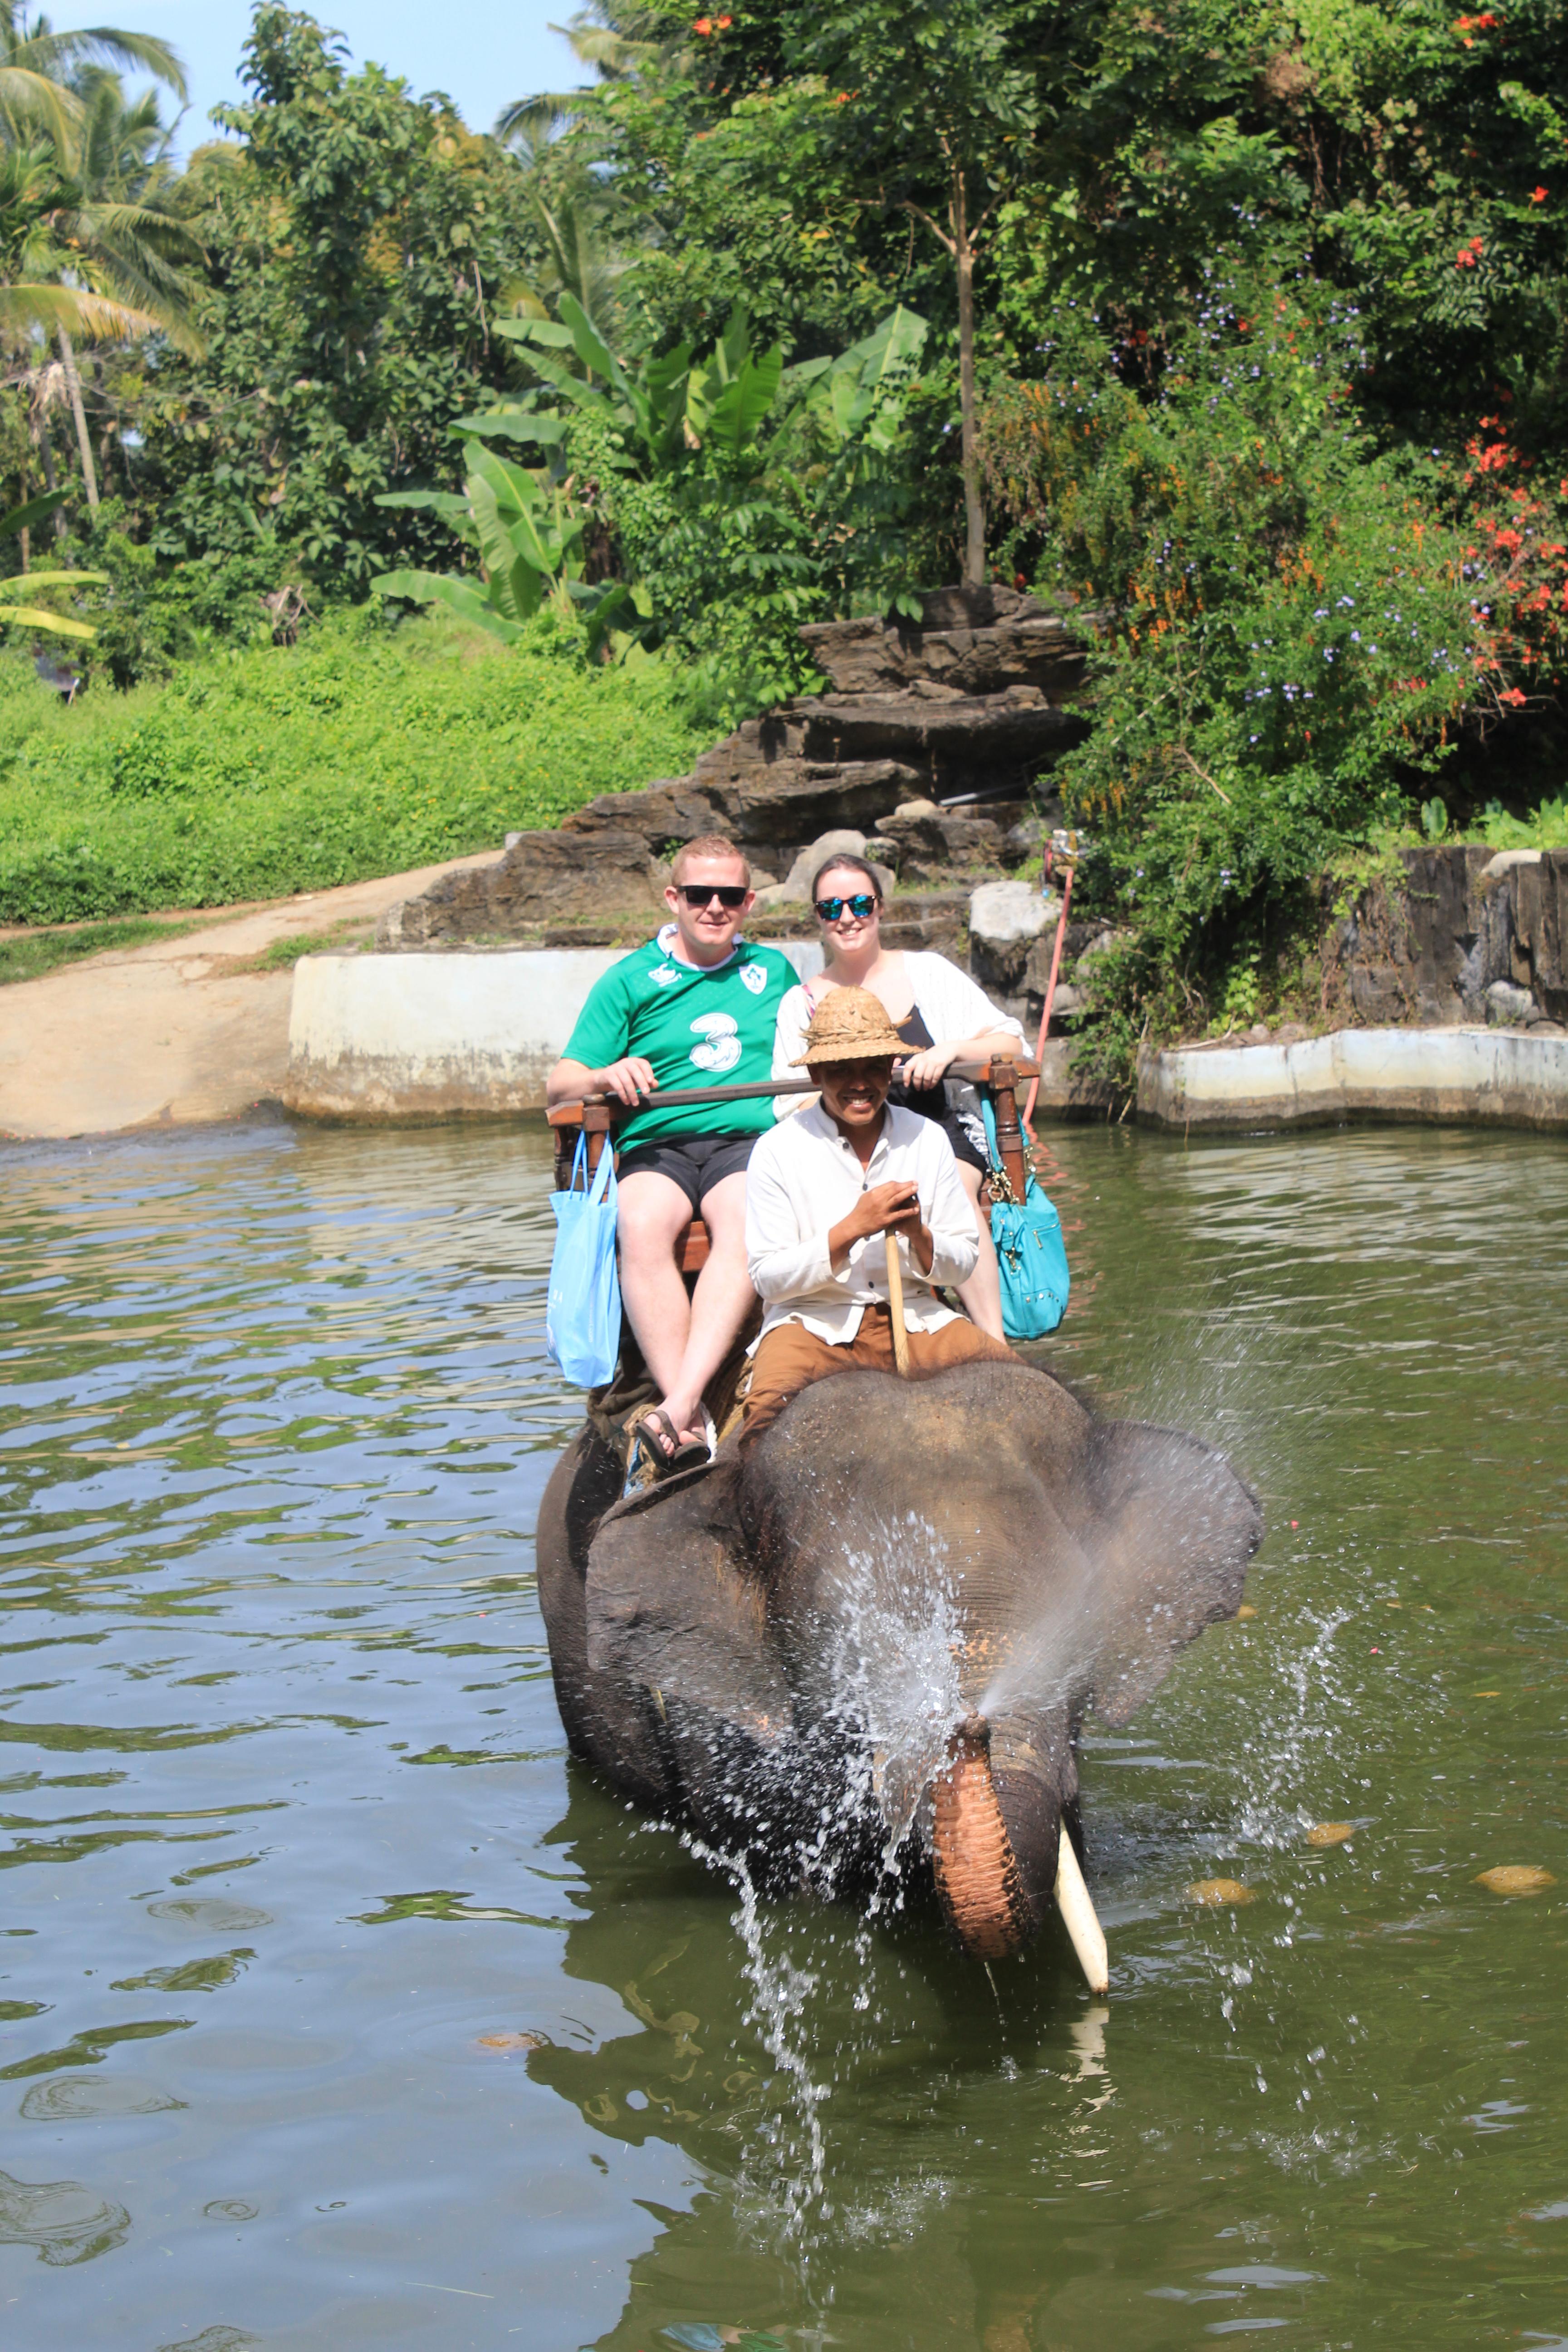 TRAVEL: ELEPHANT RIDE